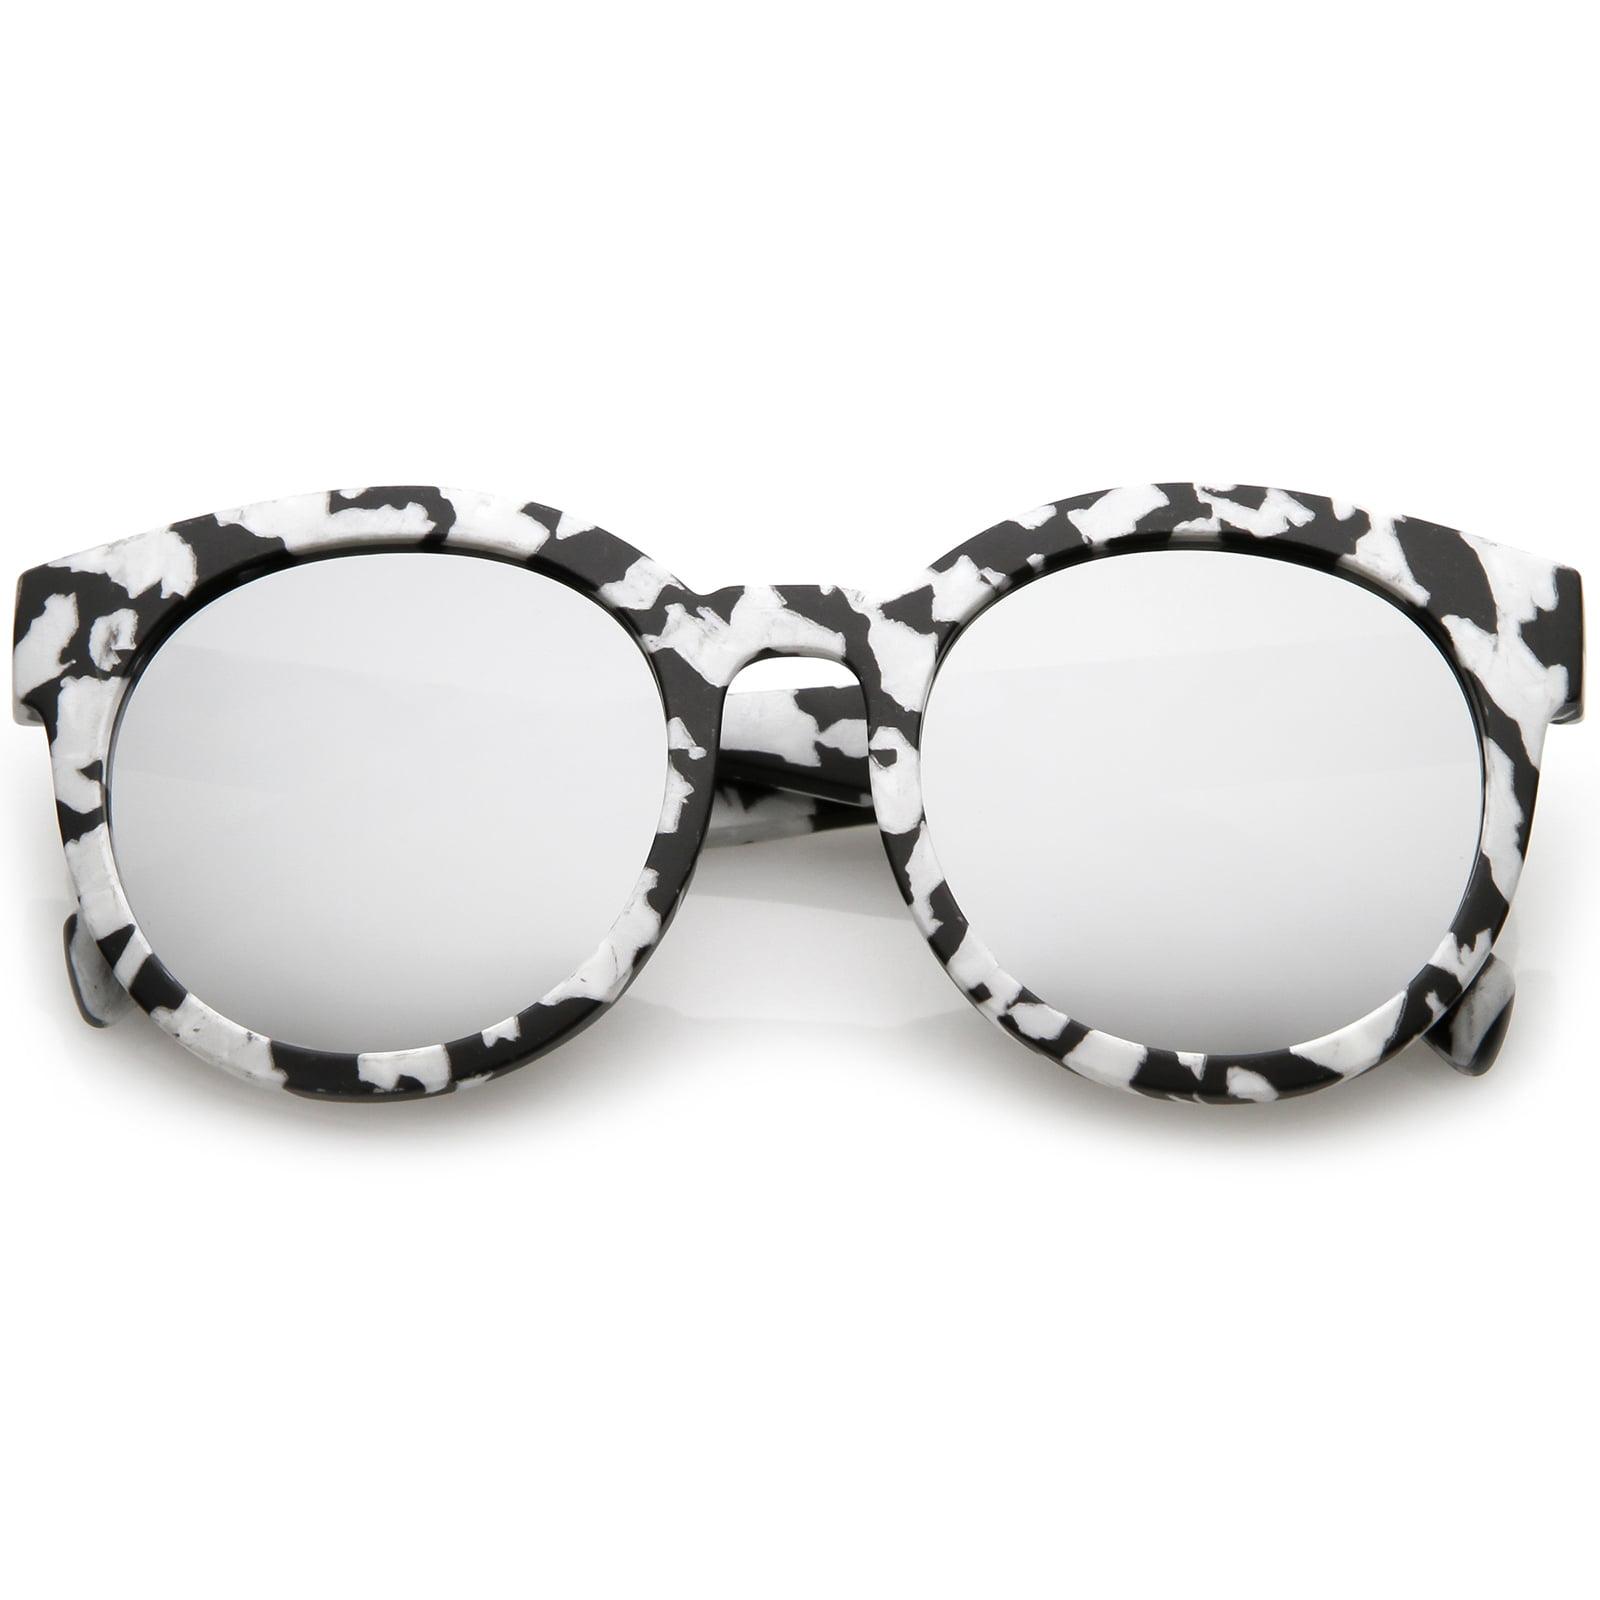 sunglassLA - Women's Matte Horn Rimmed Marble Print Flat Lens Round Sunglasses 54mm - 54mm